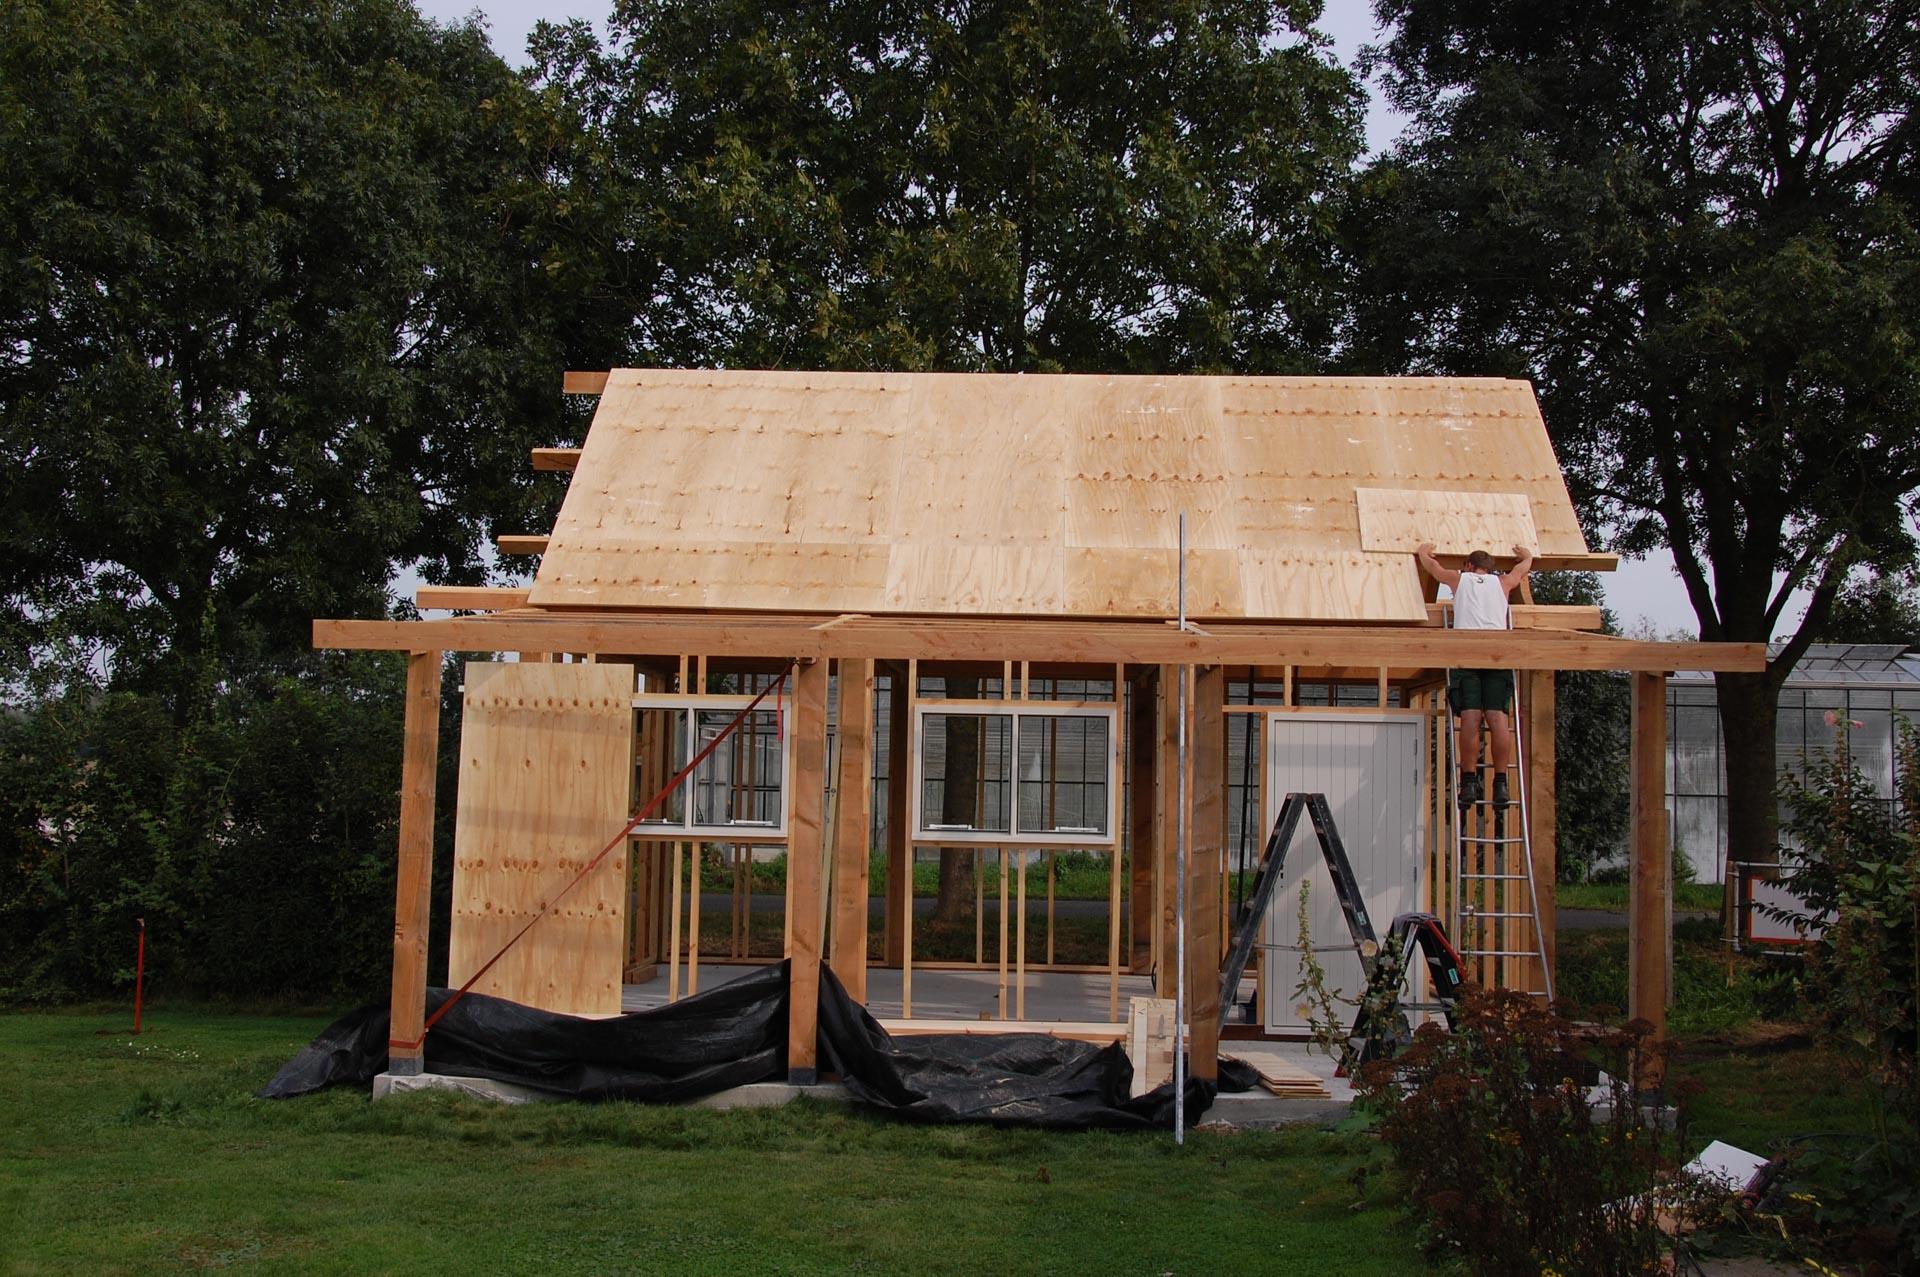 vos-hoveniers-project-tuinhuis-14